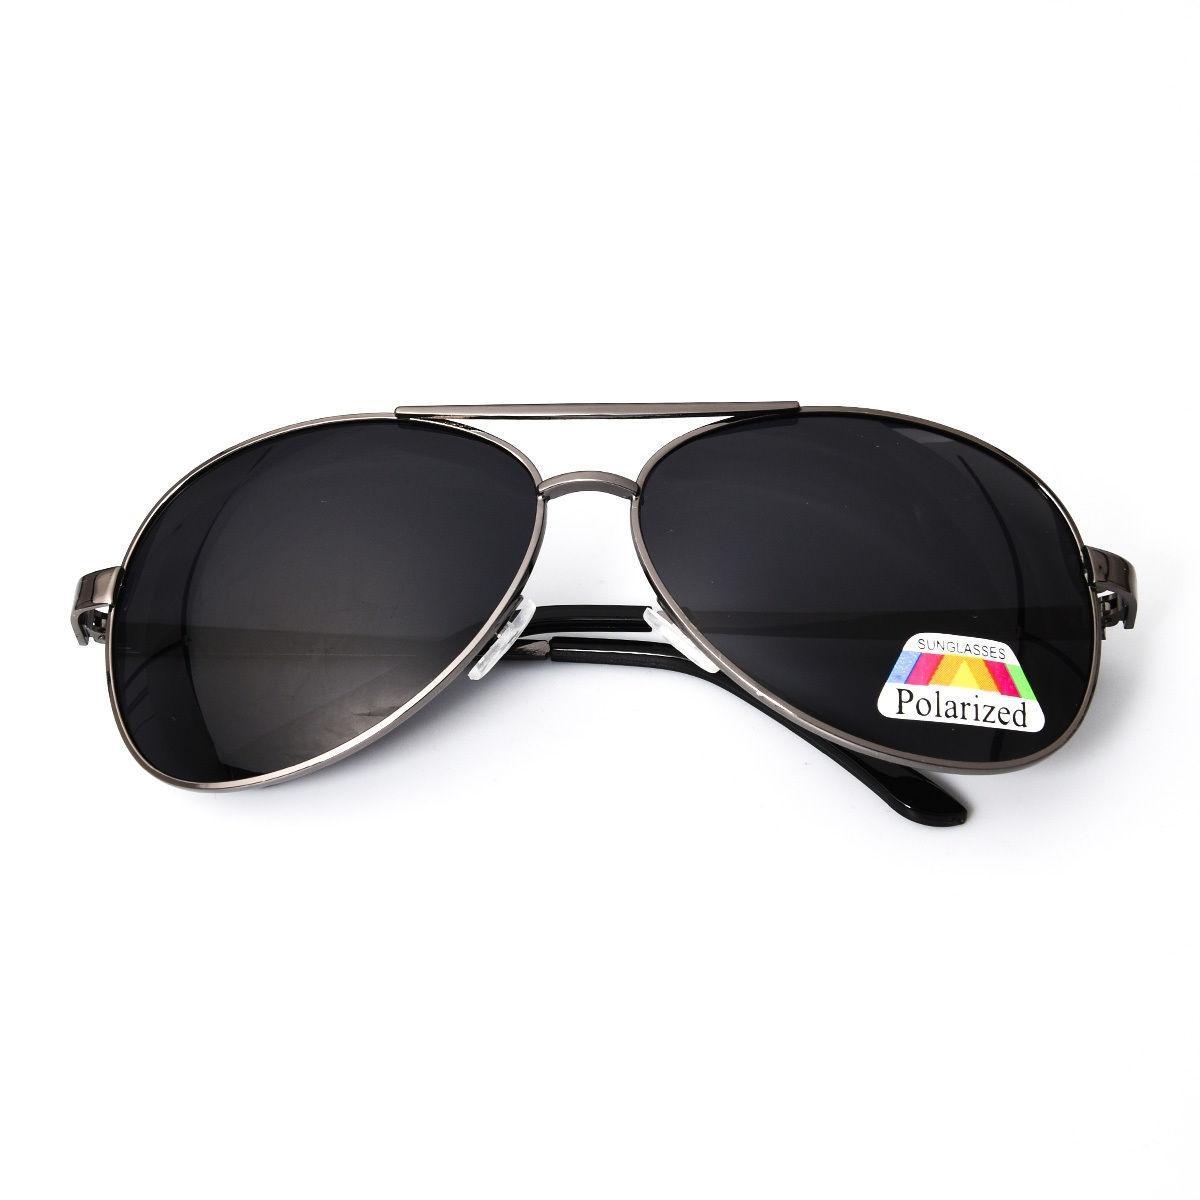 Men's Black Polarized Sunglass